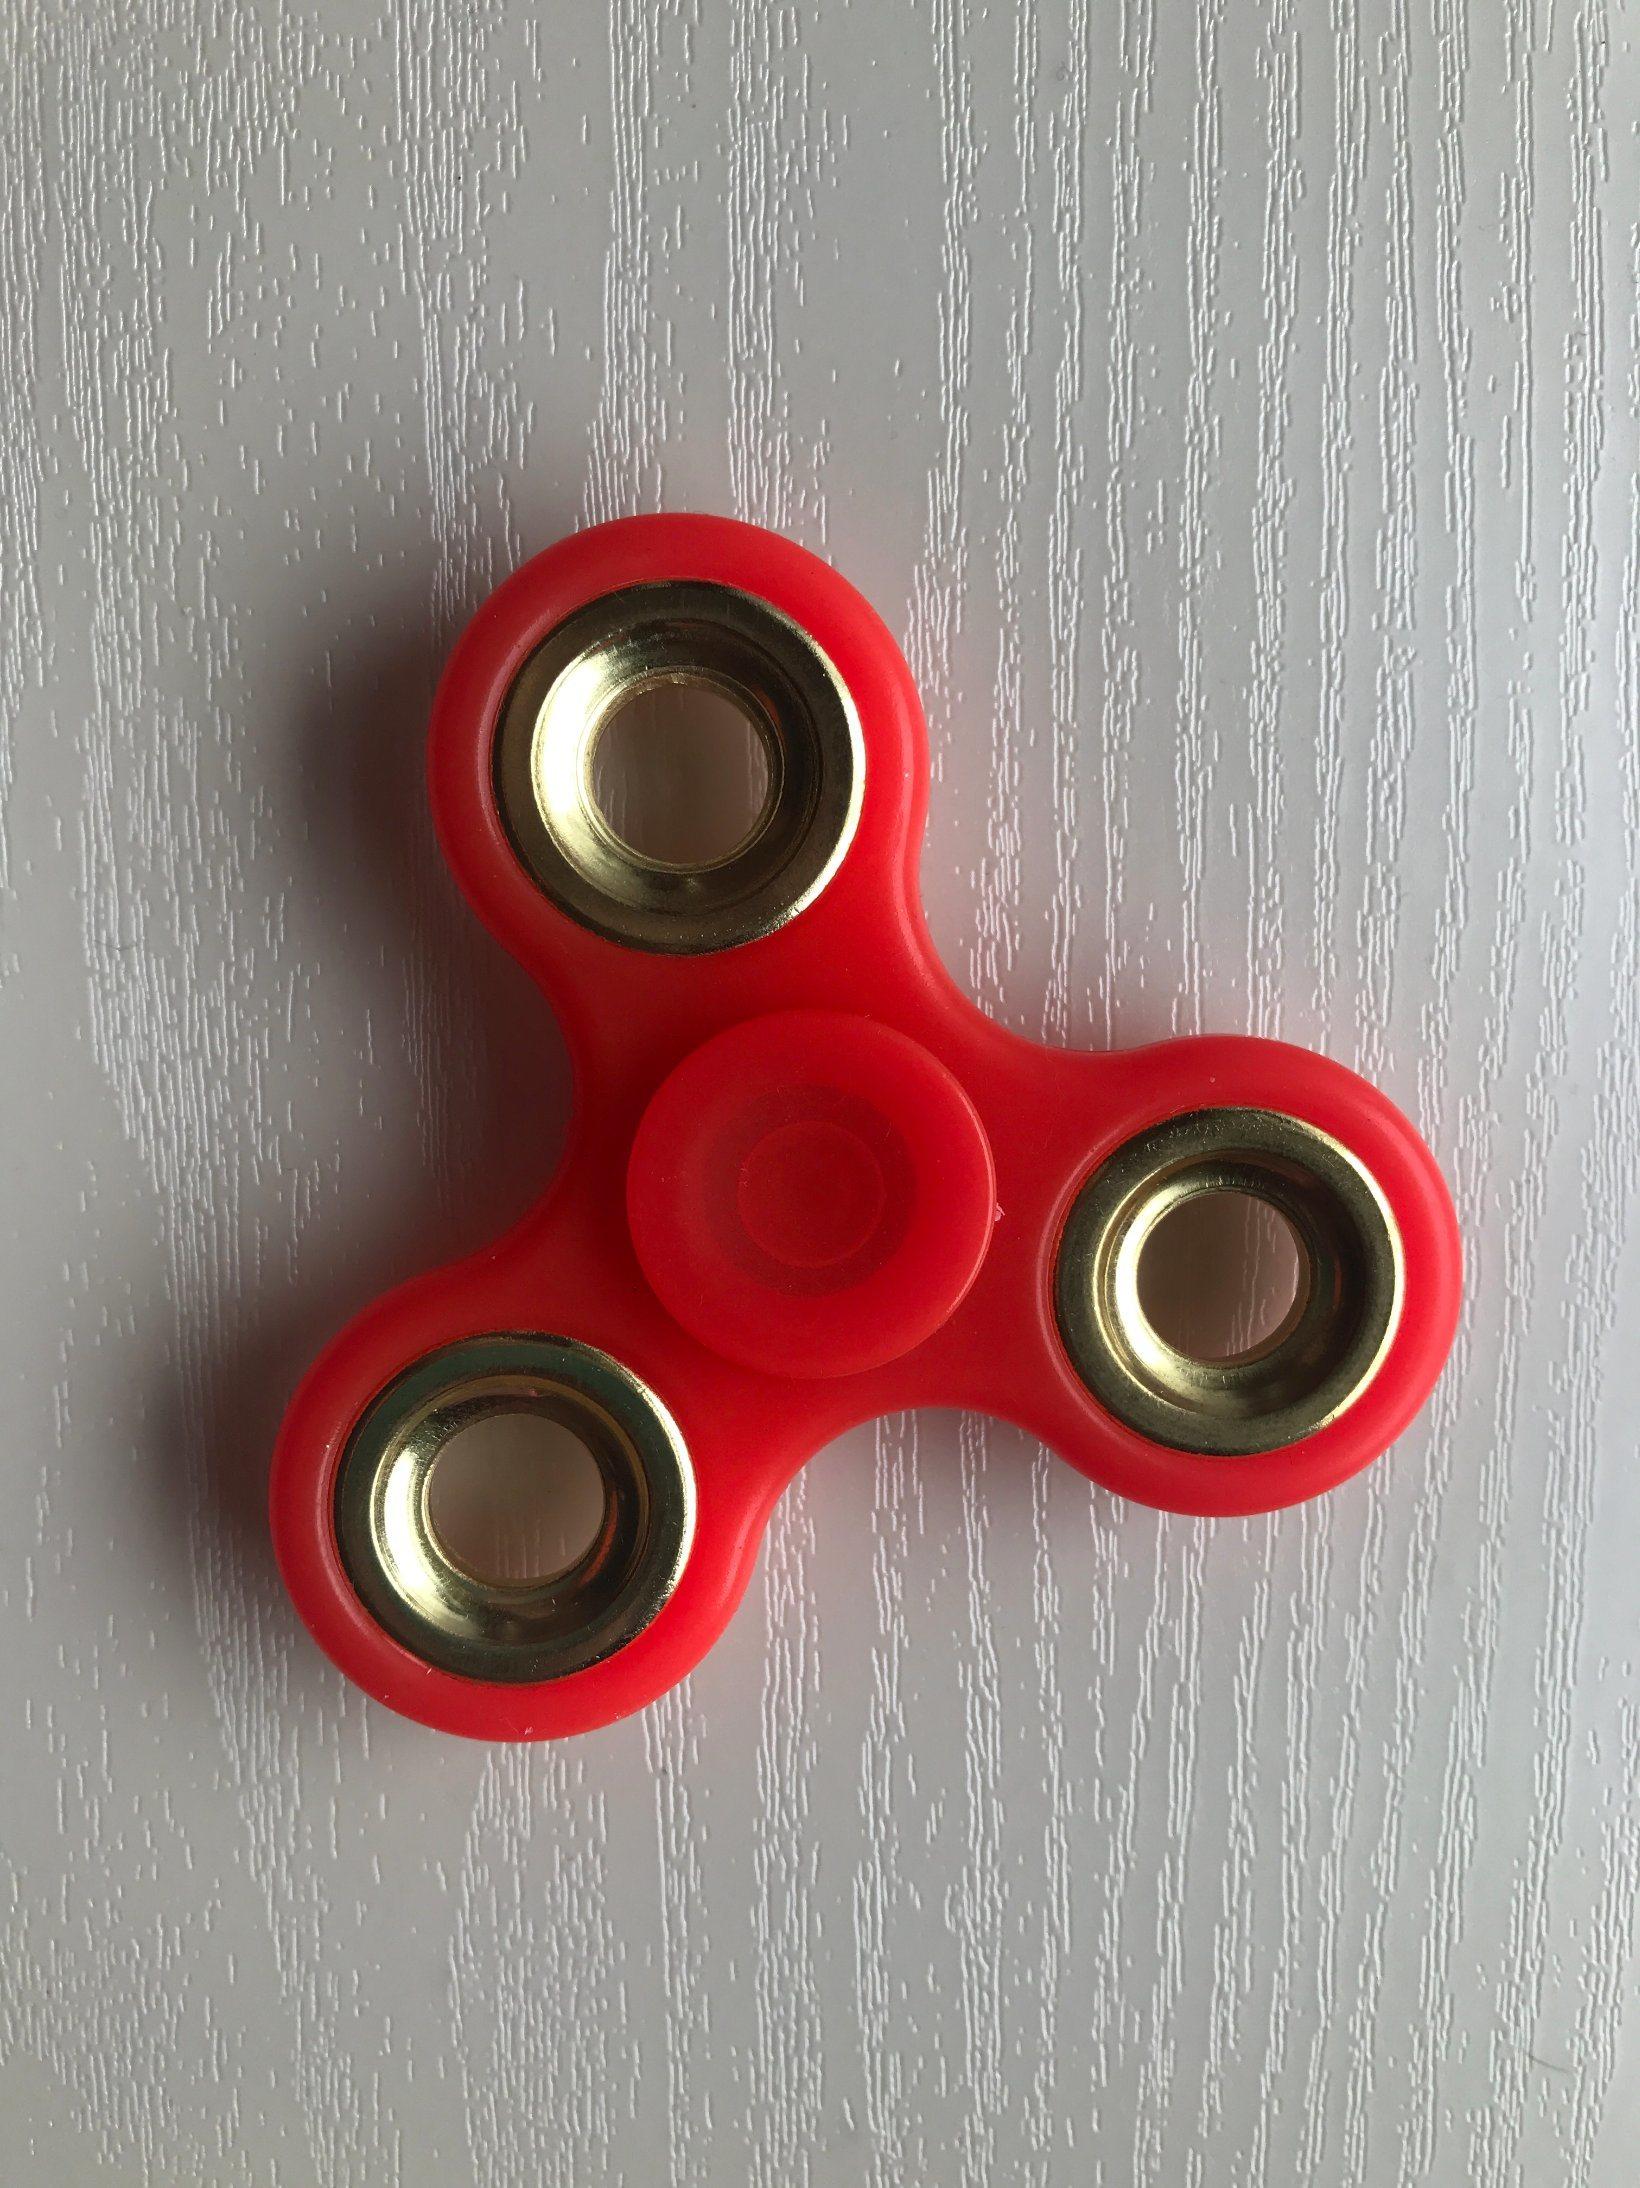 Good Quality Smooth Luminous Finger Hand Spinner Fidget Toys